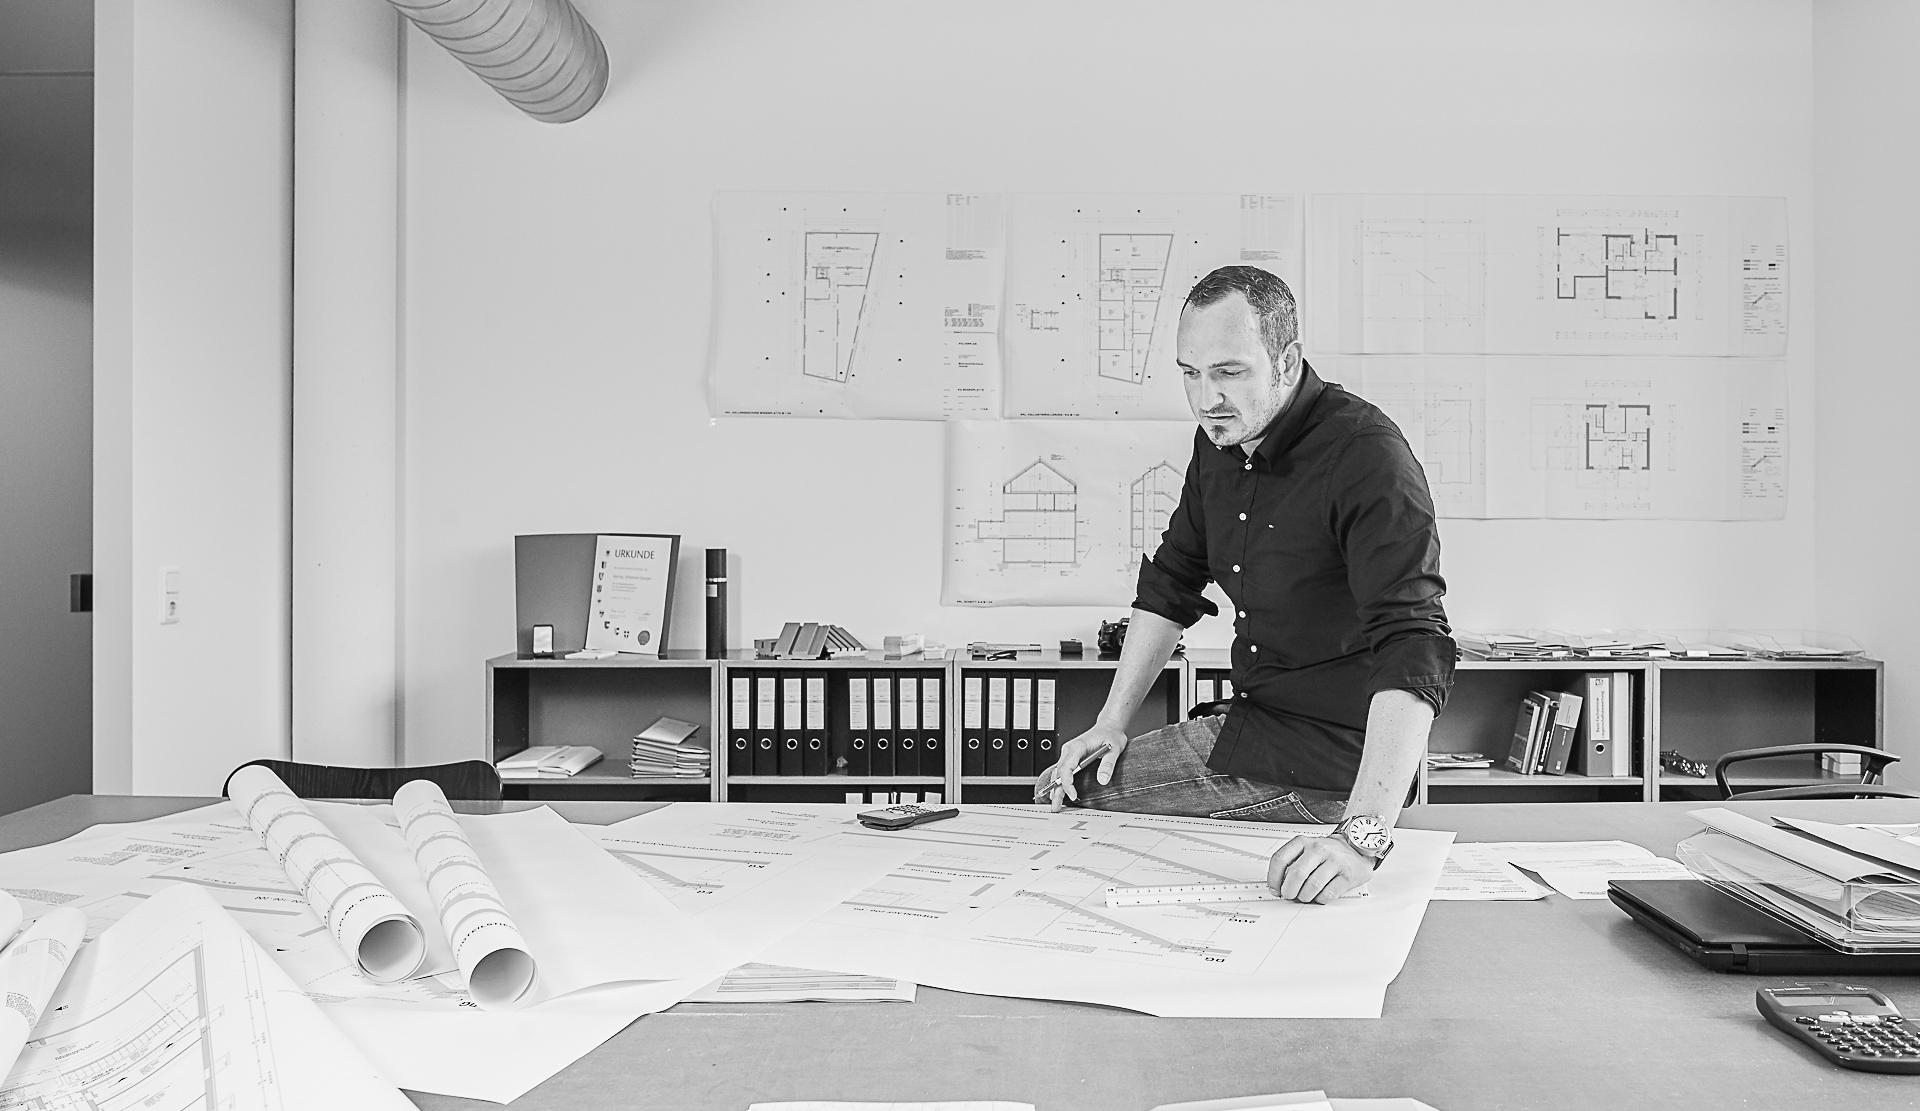 bmstr di fh daniel gisinger gmbh planung i baumanagement i gutachten. Black Bedroom Furniture Sets. Home Design Ideas